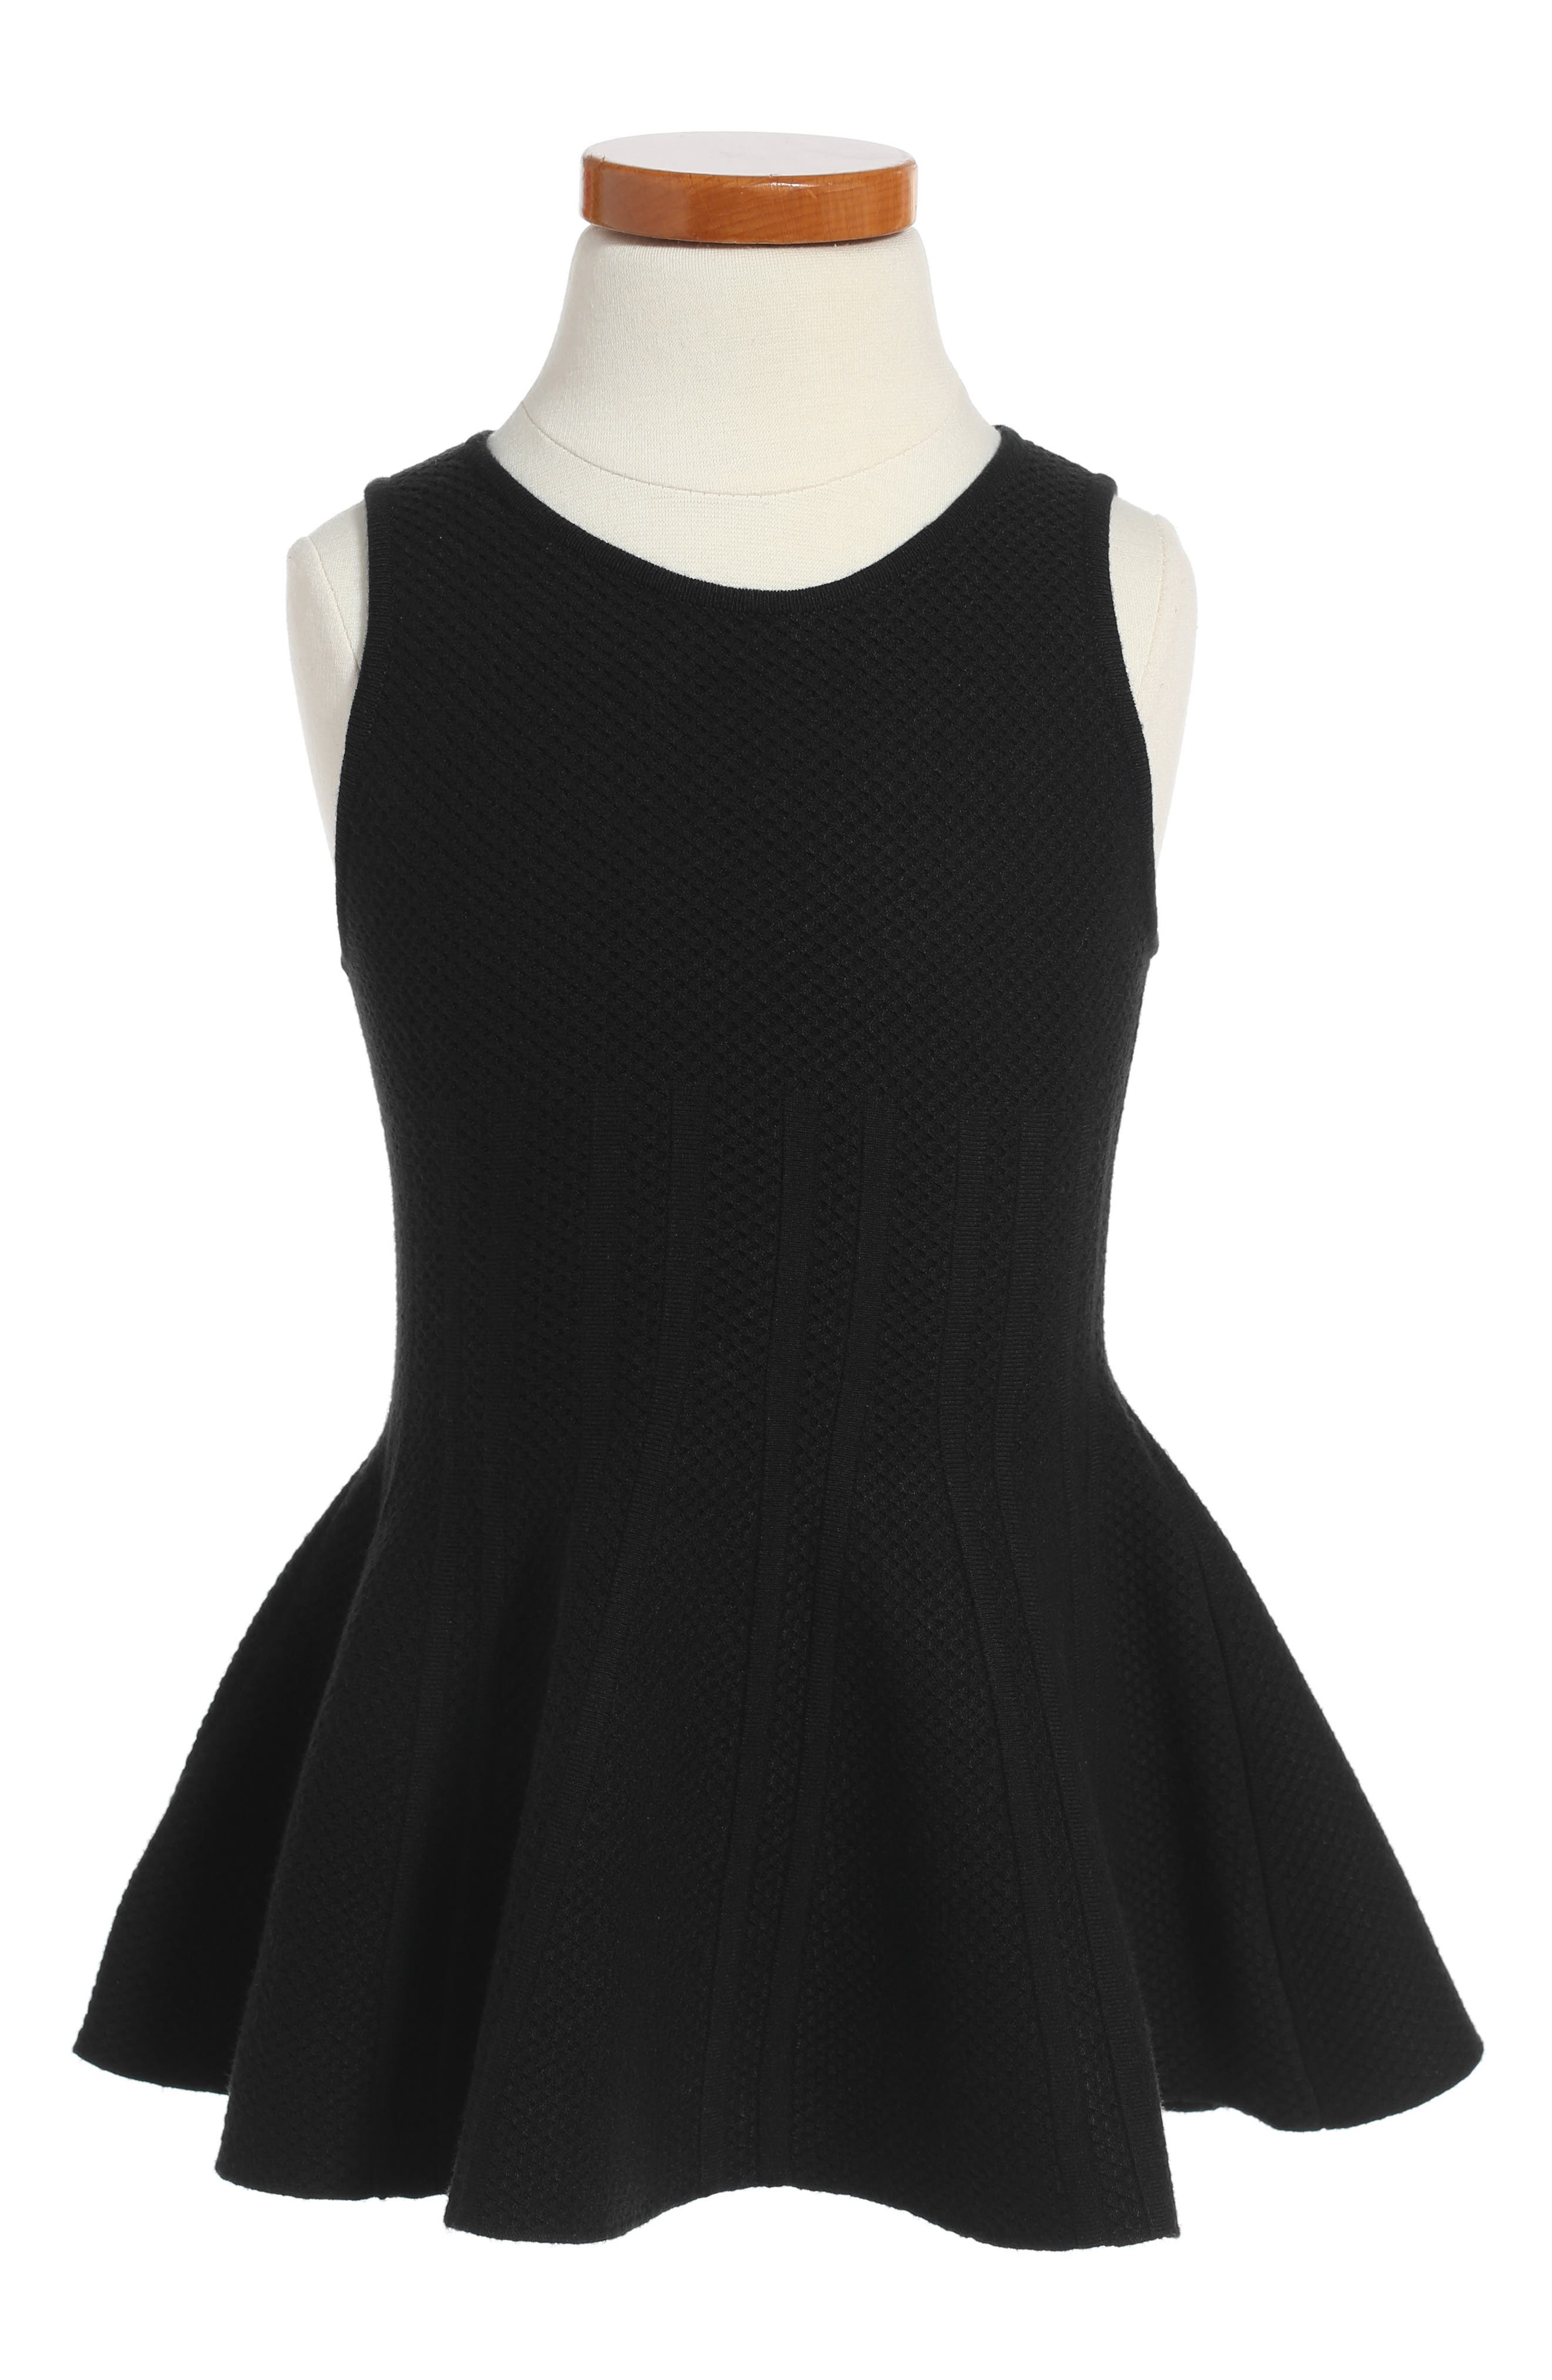 Alternate Image 1 Selected - Milly Minis Peplum Hem Dress (Toddler Girls, Little Girls & Big Girls)